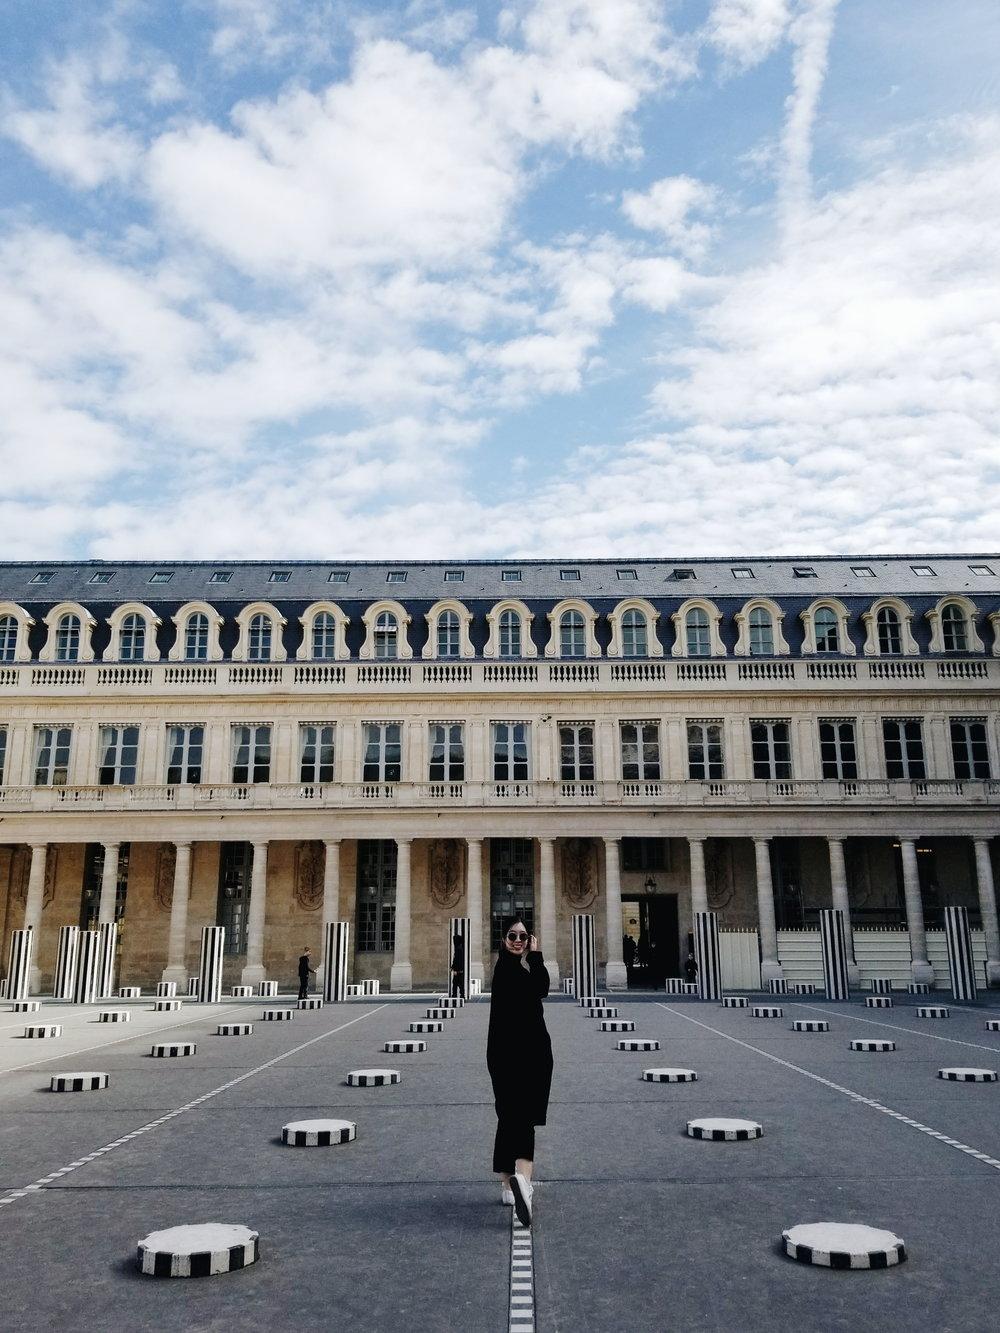 postcards-from-paris-palais-de-royal-01.jpg